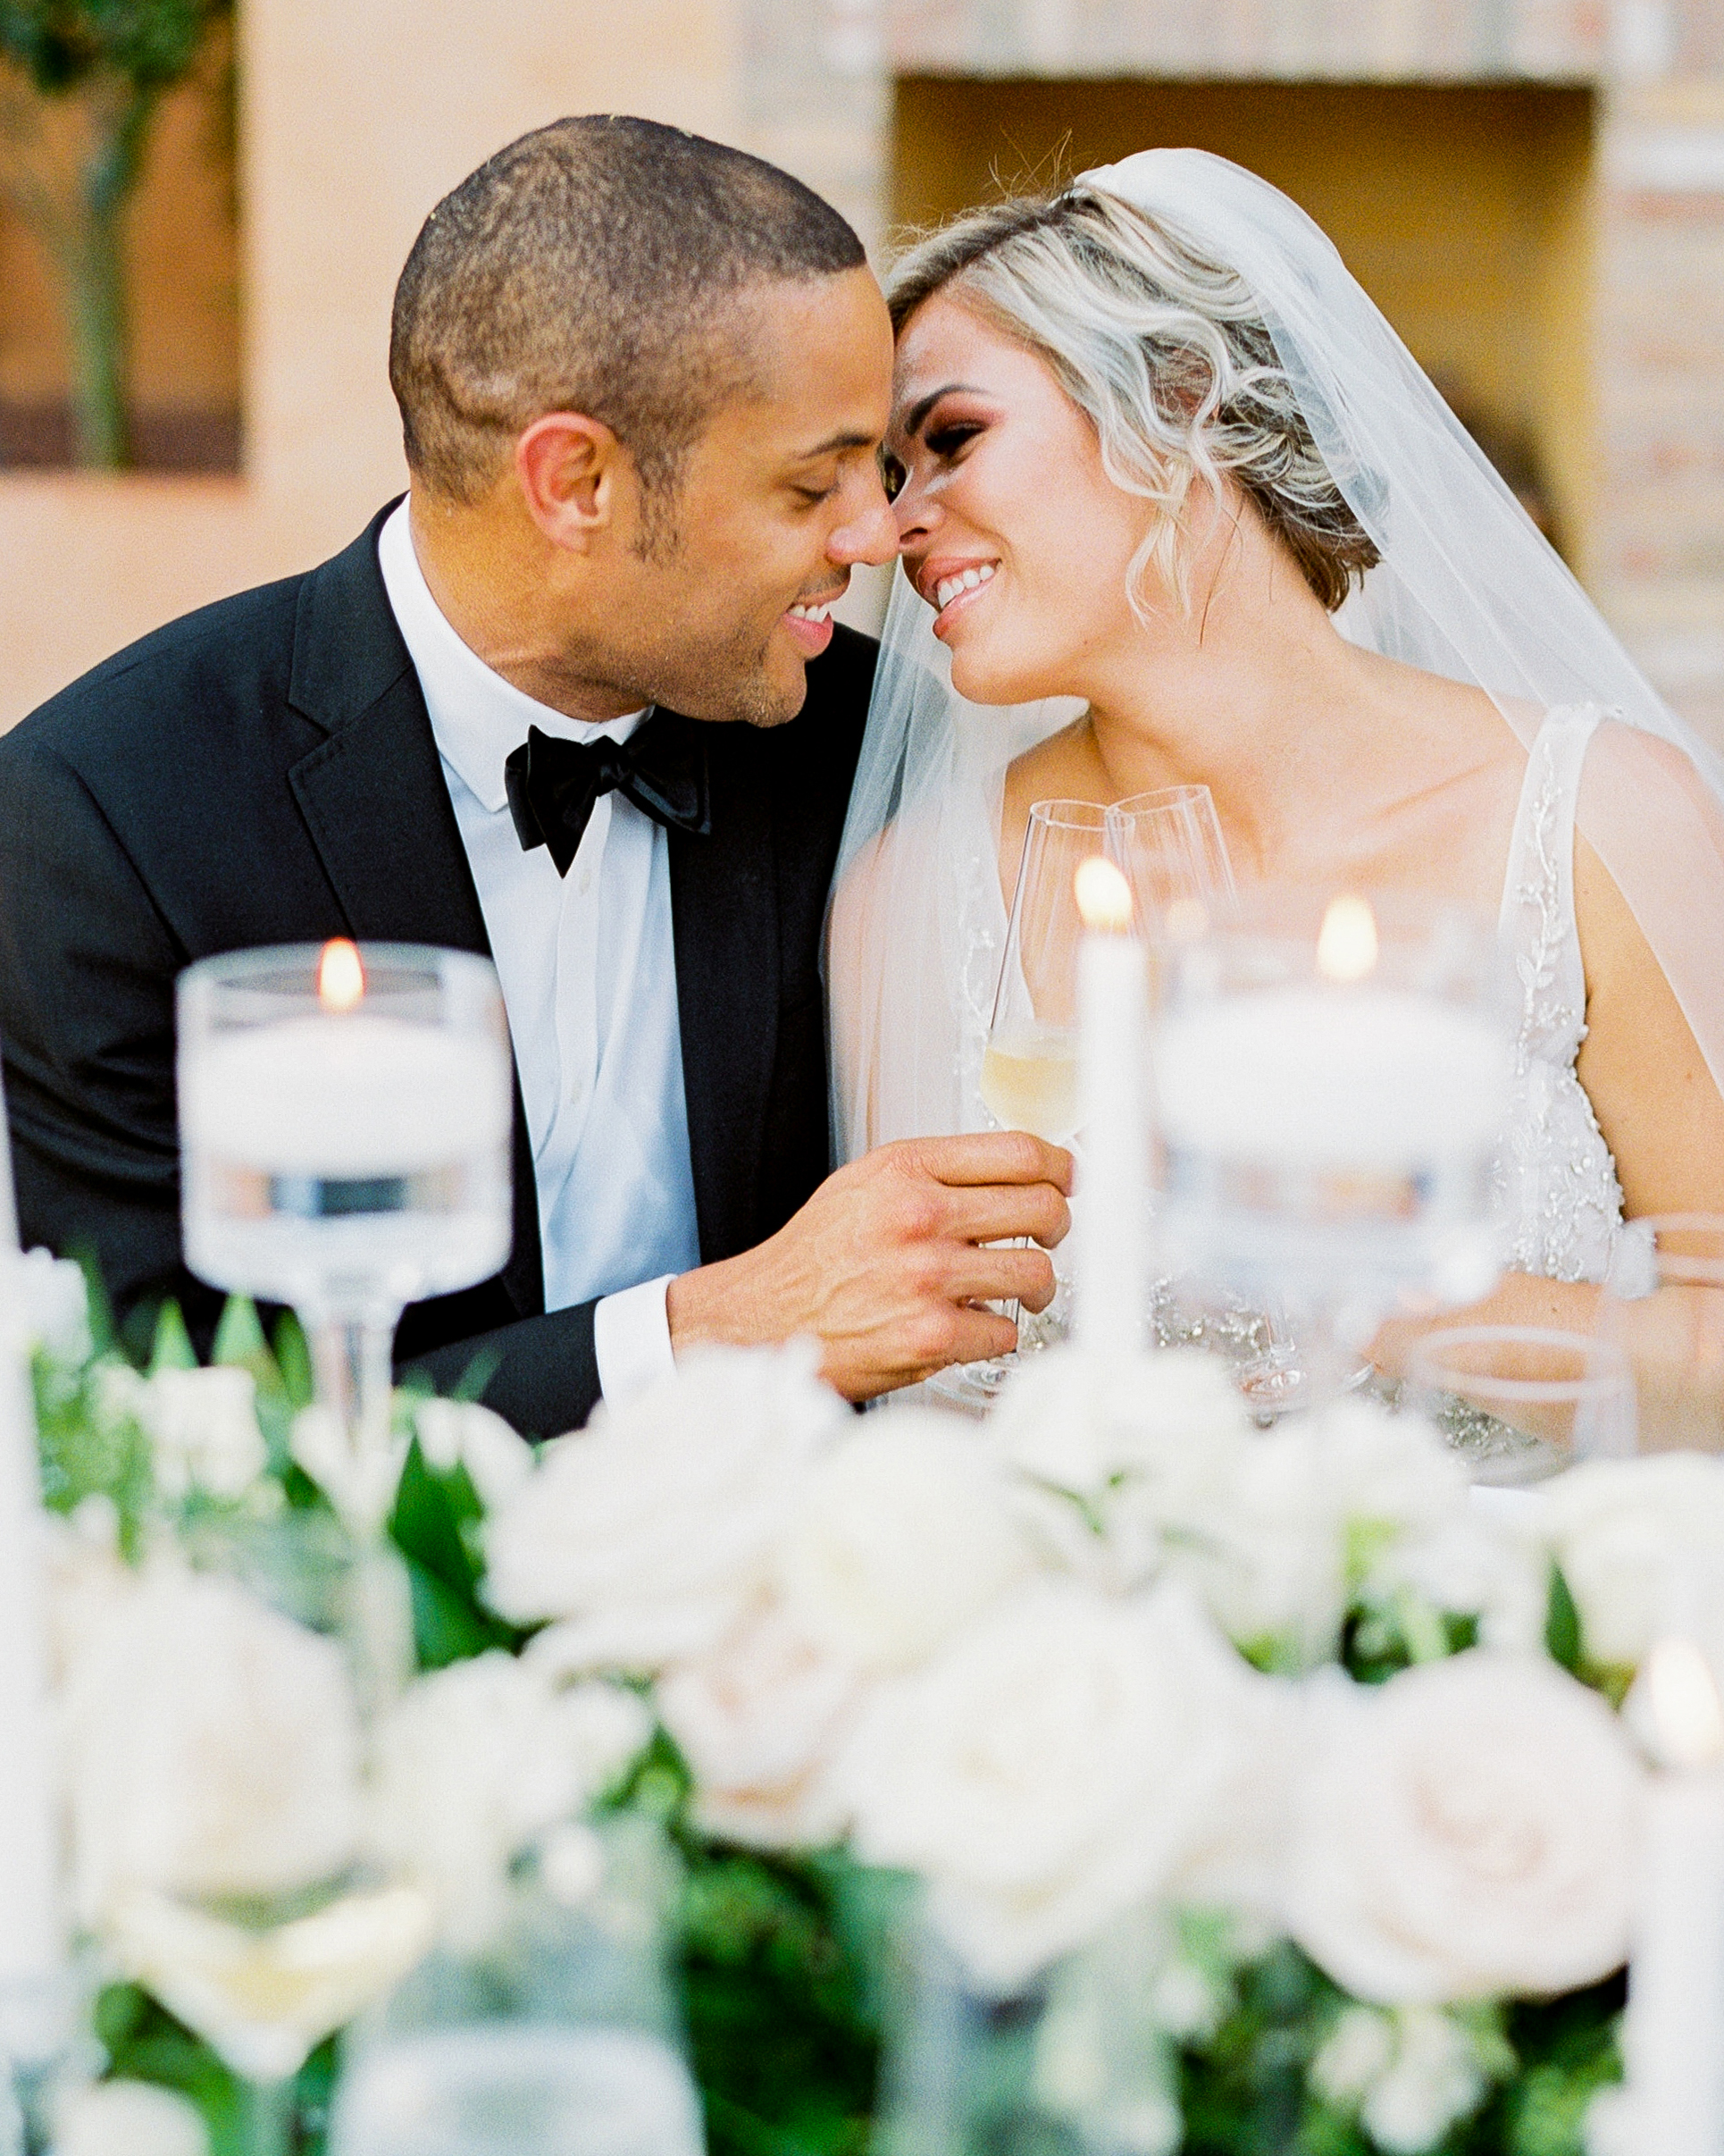 Elizabeth and Robert wedding reception couple